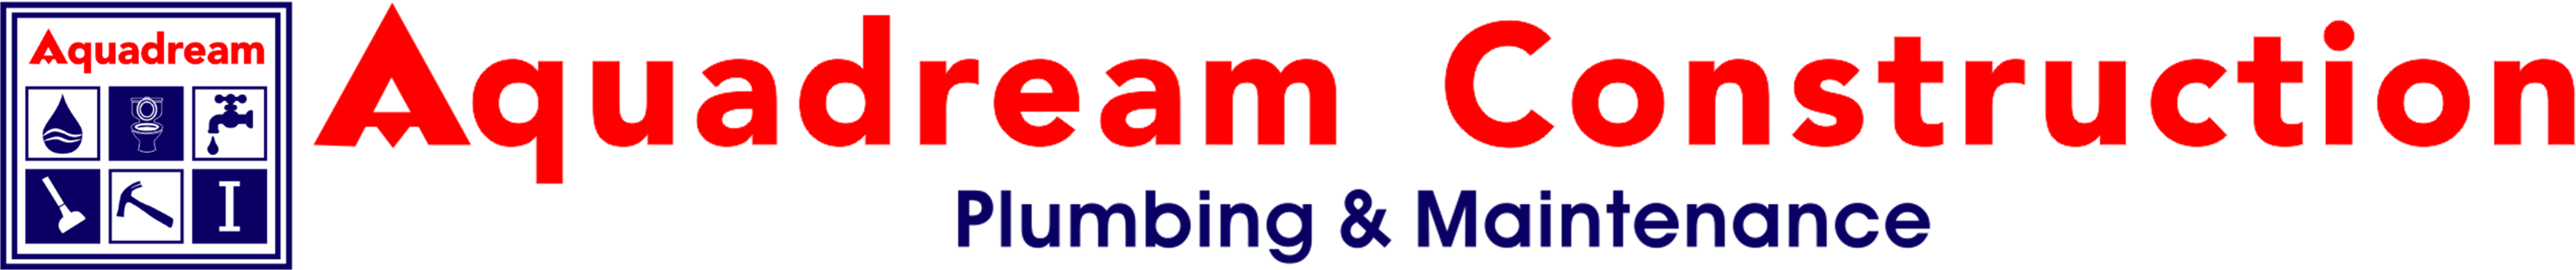 Aquadream Plumbing & Maintenance